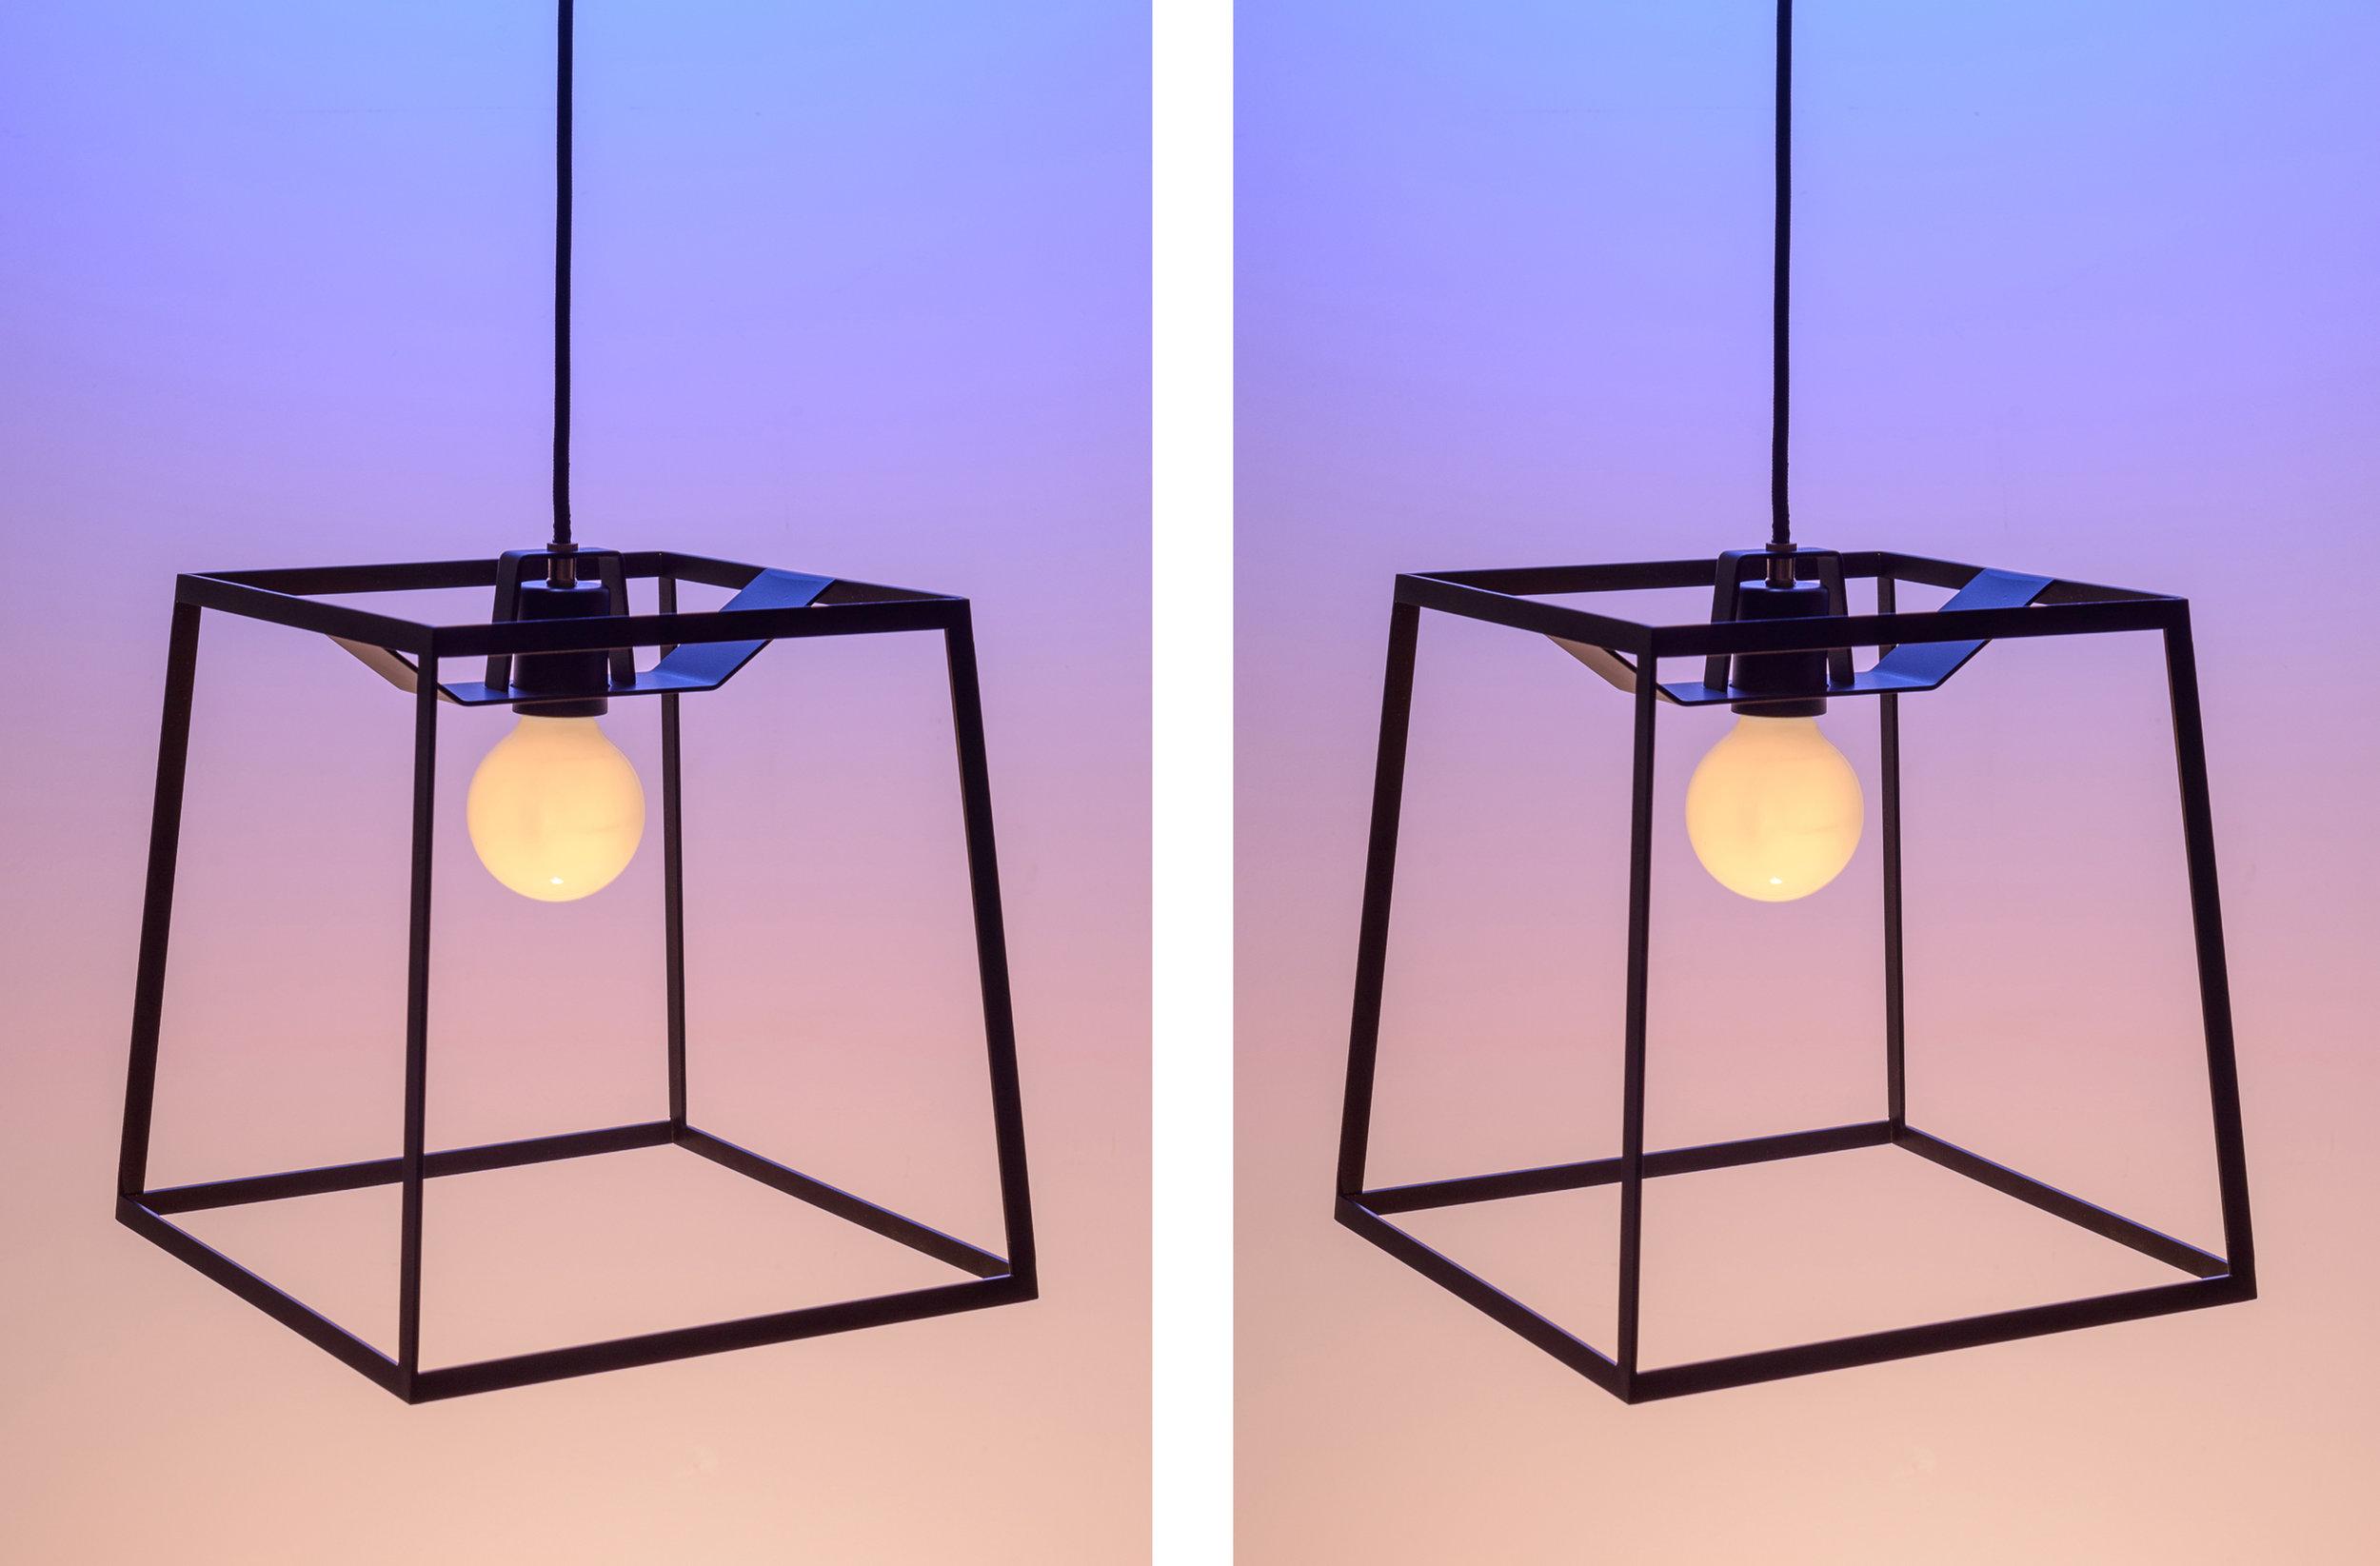 Medium Frame Light / Photo by Amanda Ringstad